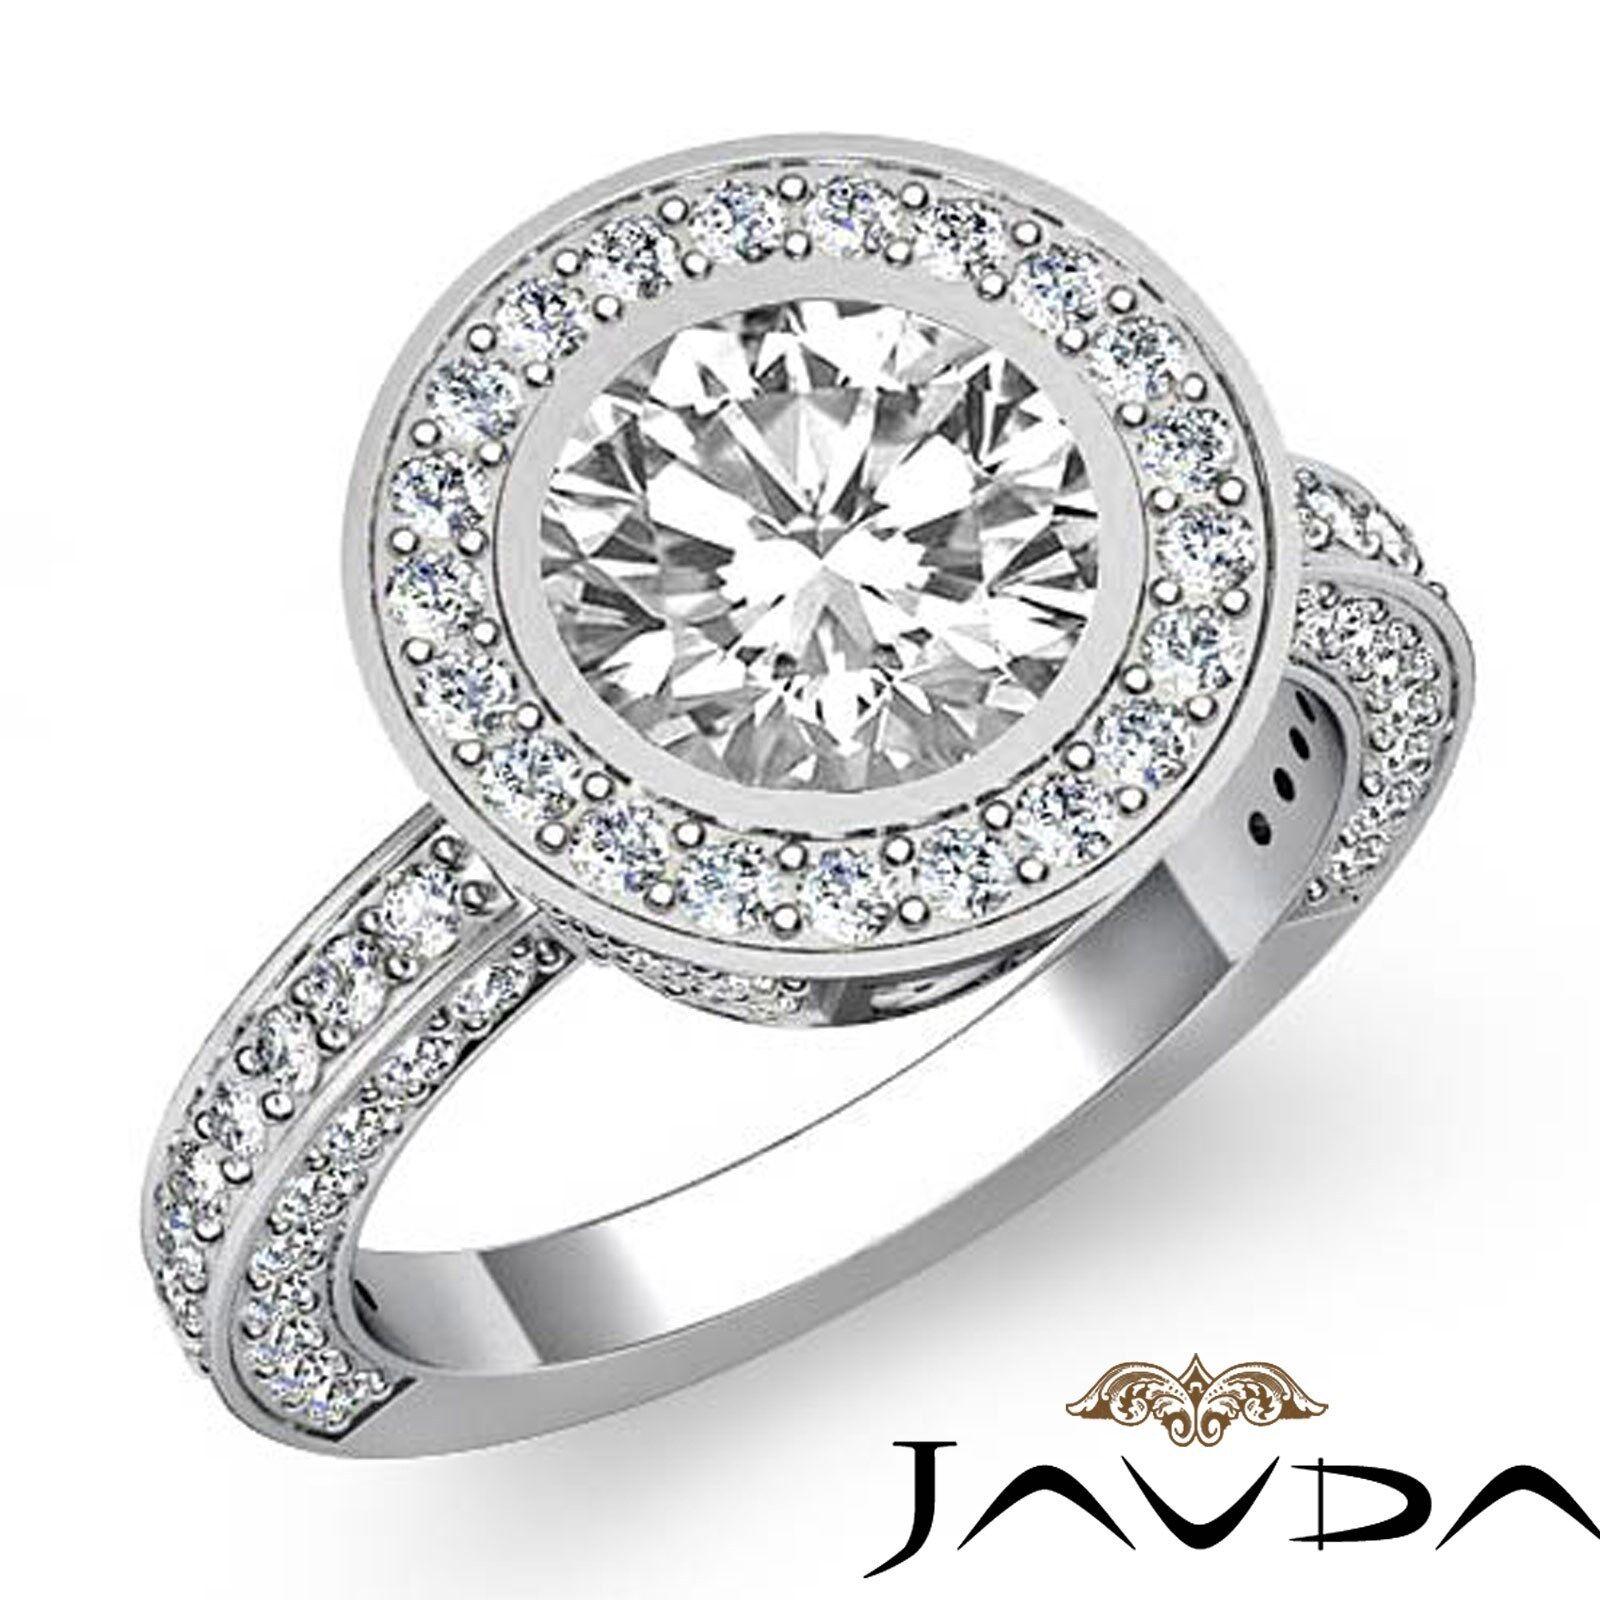 Bezel Halo Pave Set Round Diamond Engagement Filigree Ring GIA H Color VS1 3 Ct